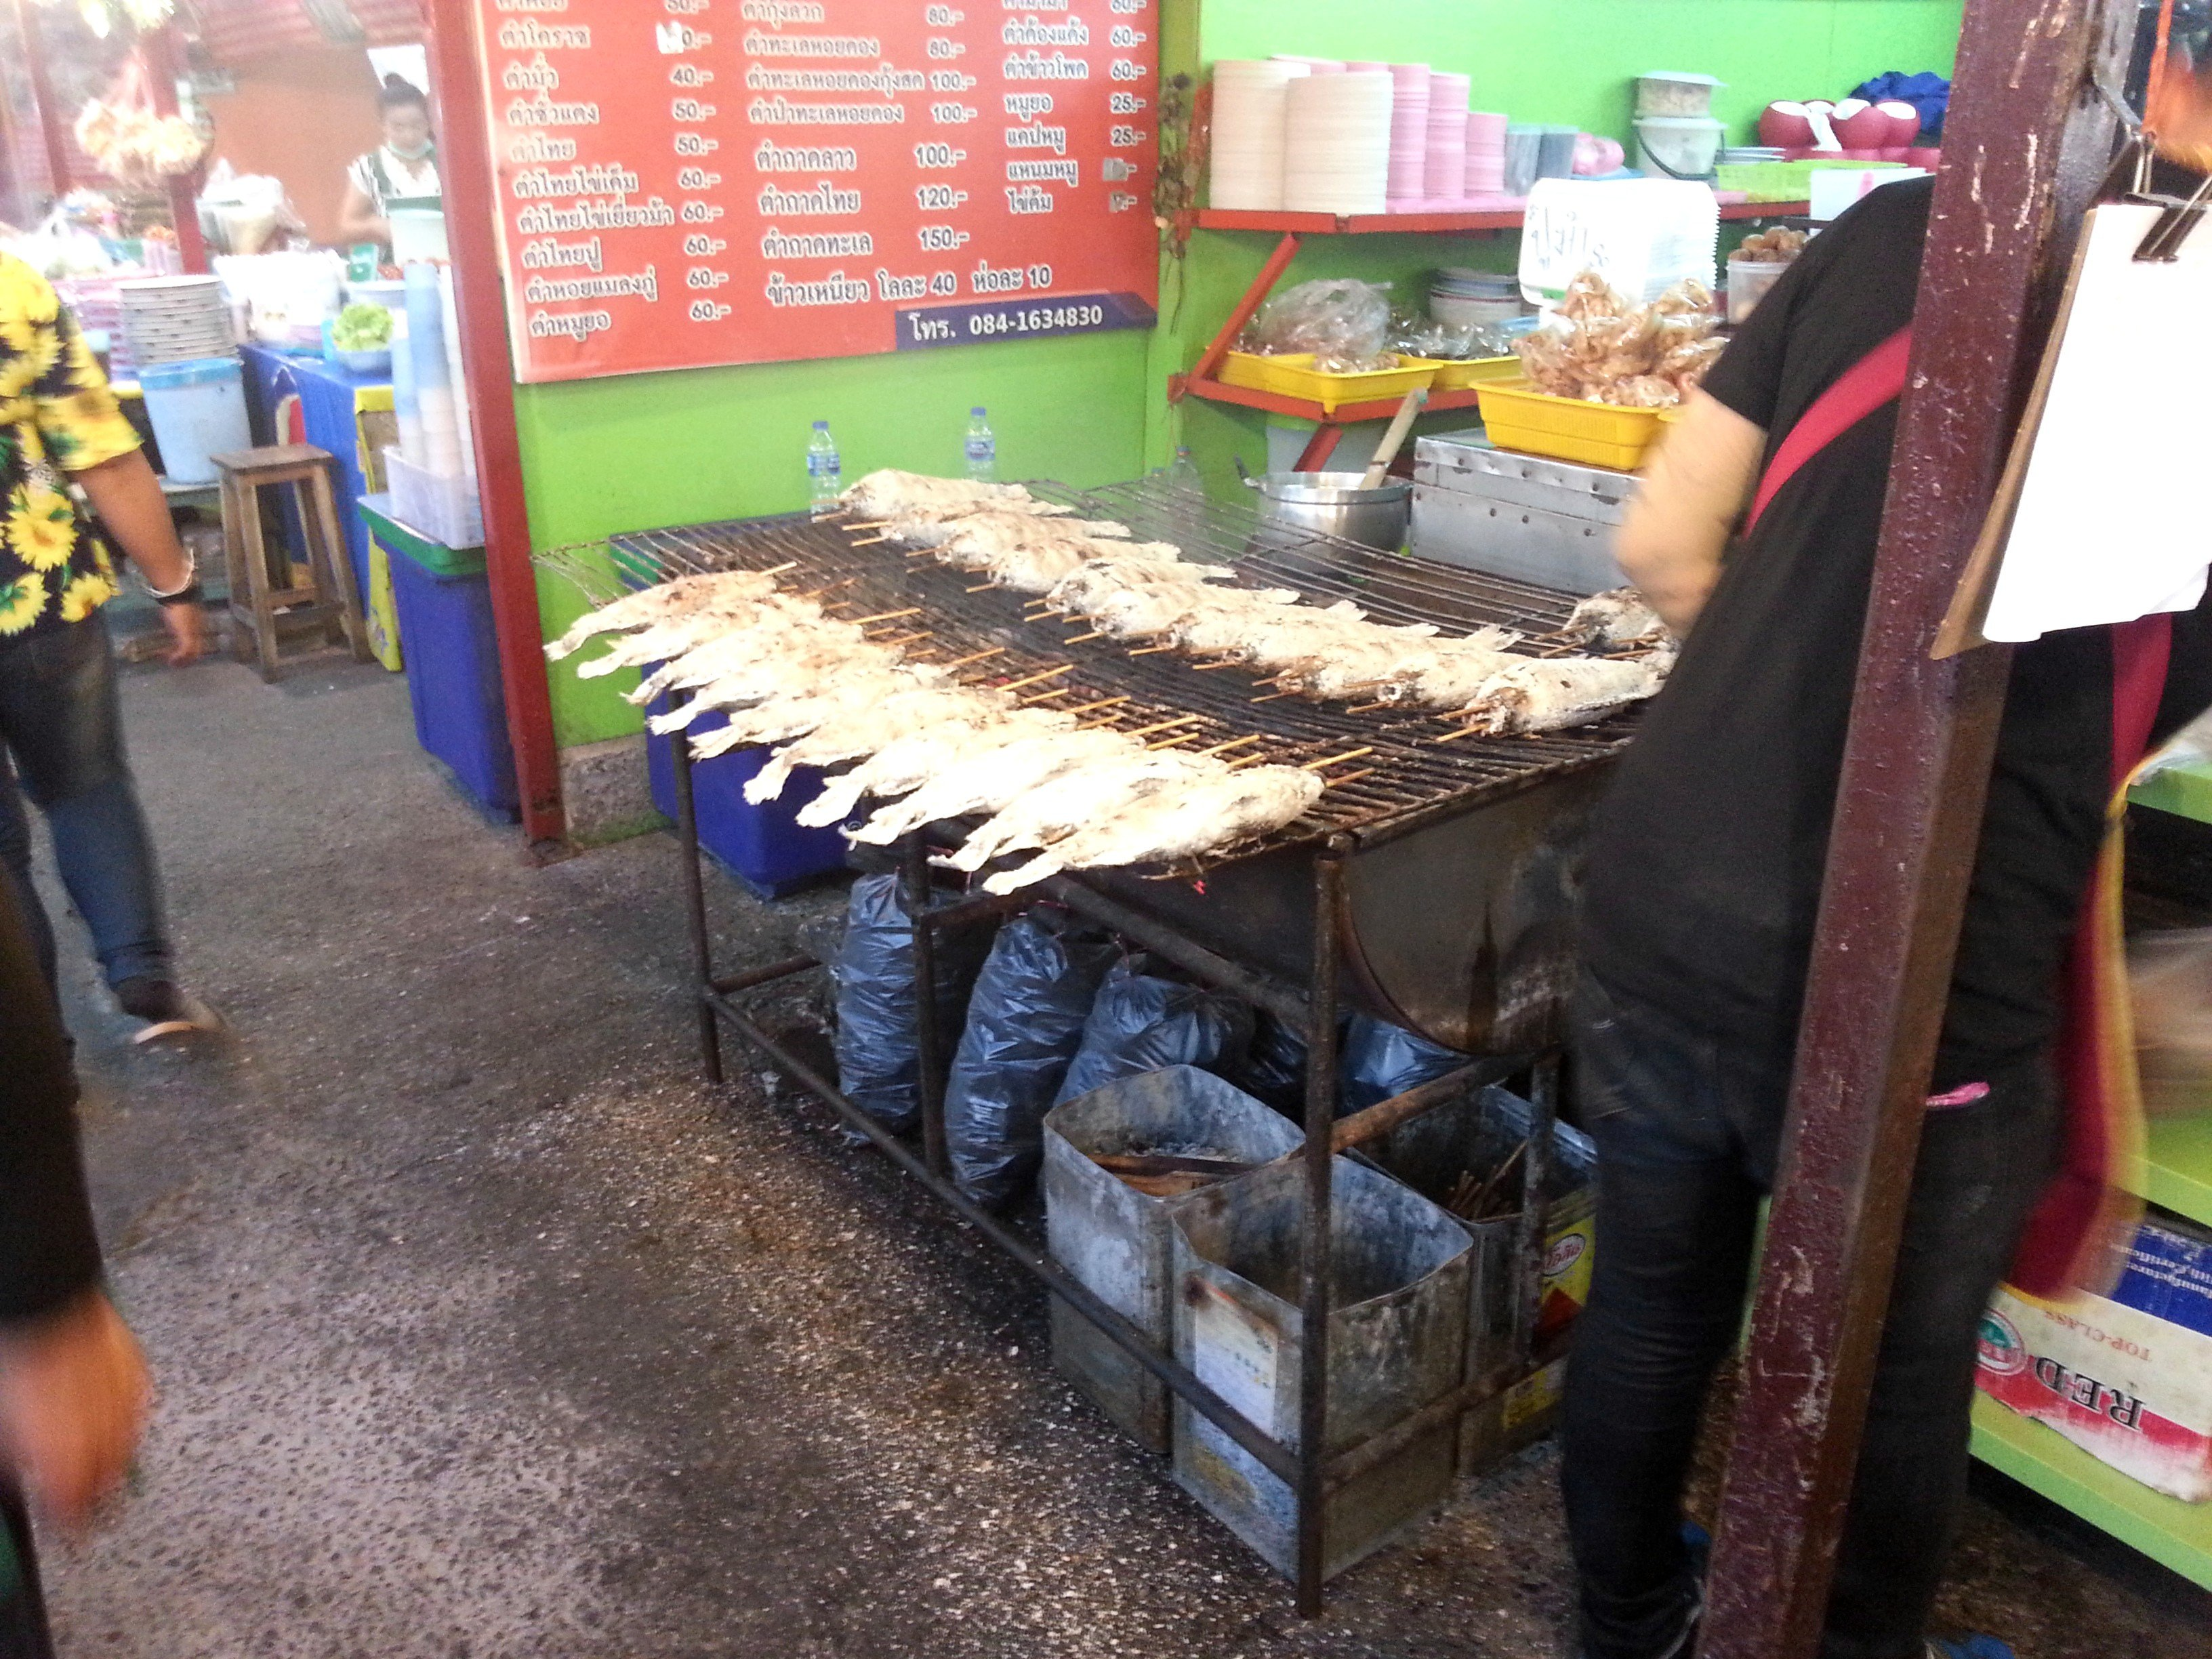 Grilled salt fish at Udon Thani Night Market